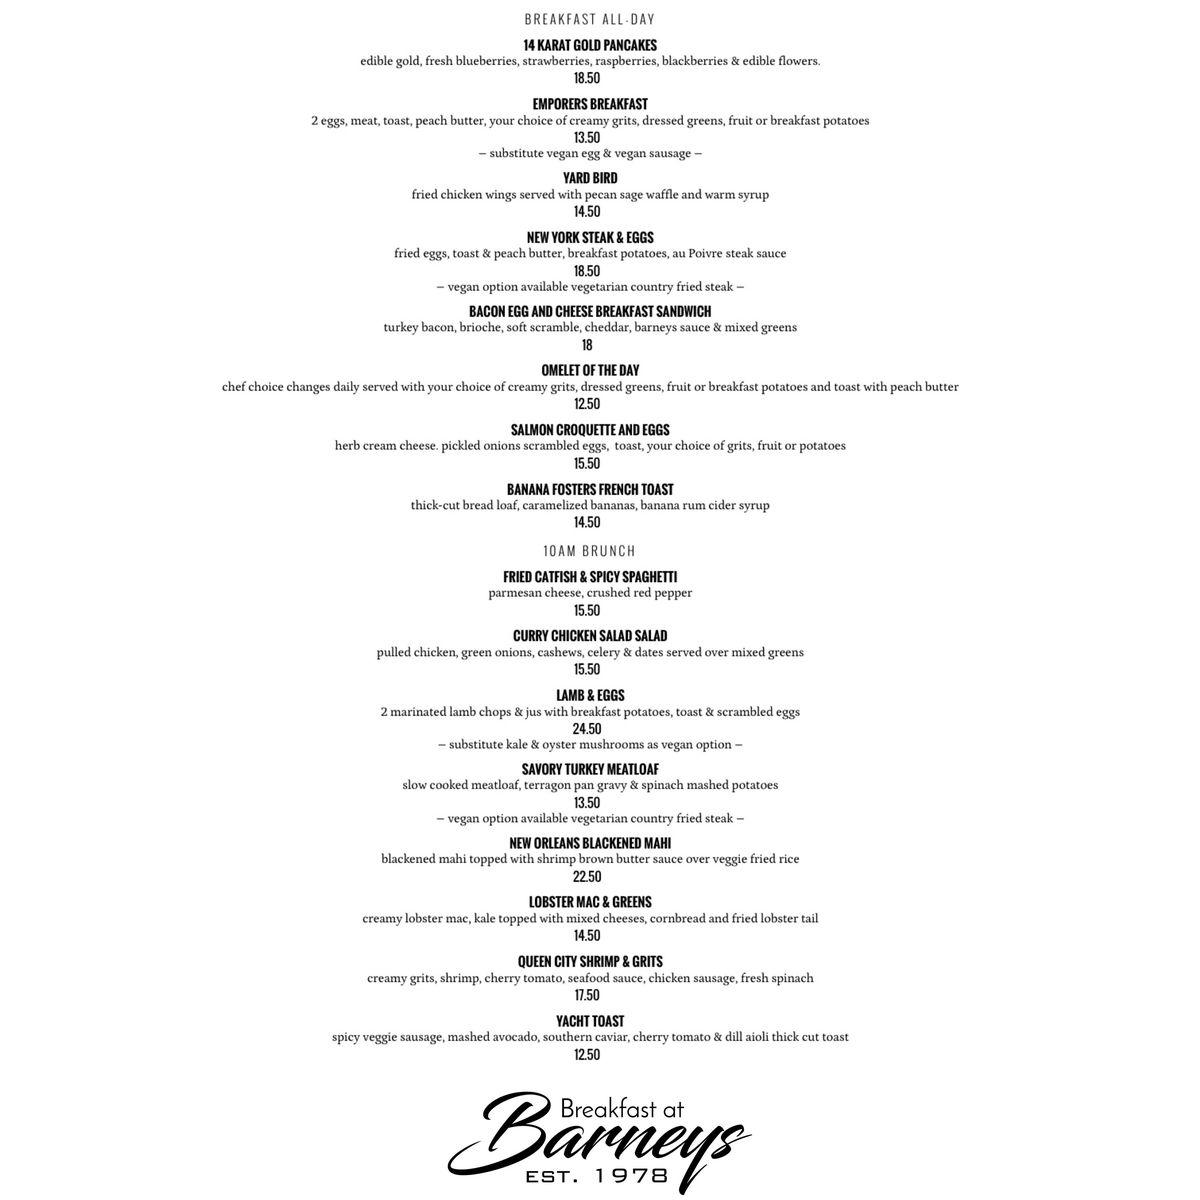 The breakfast menu for Breakfast at Barney in Atlanta